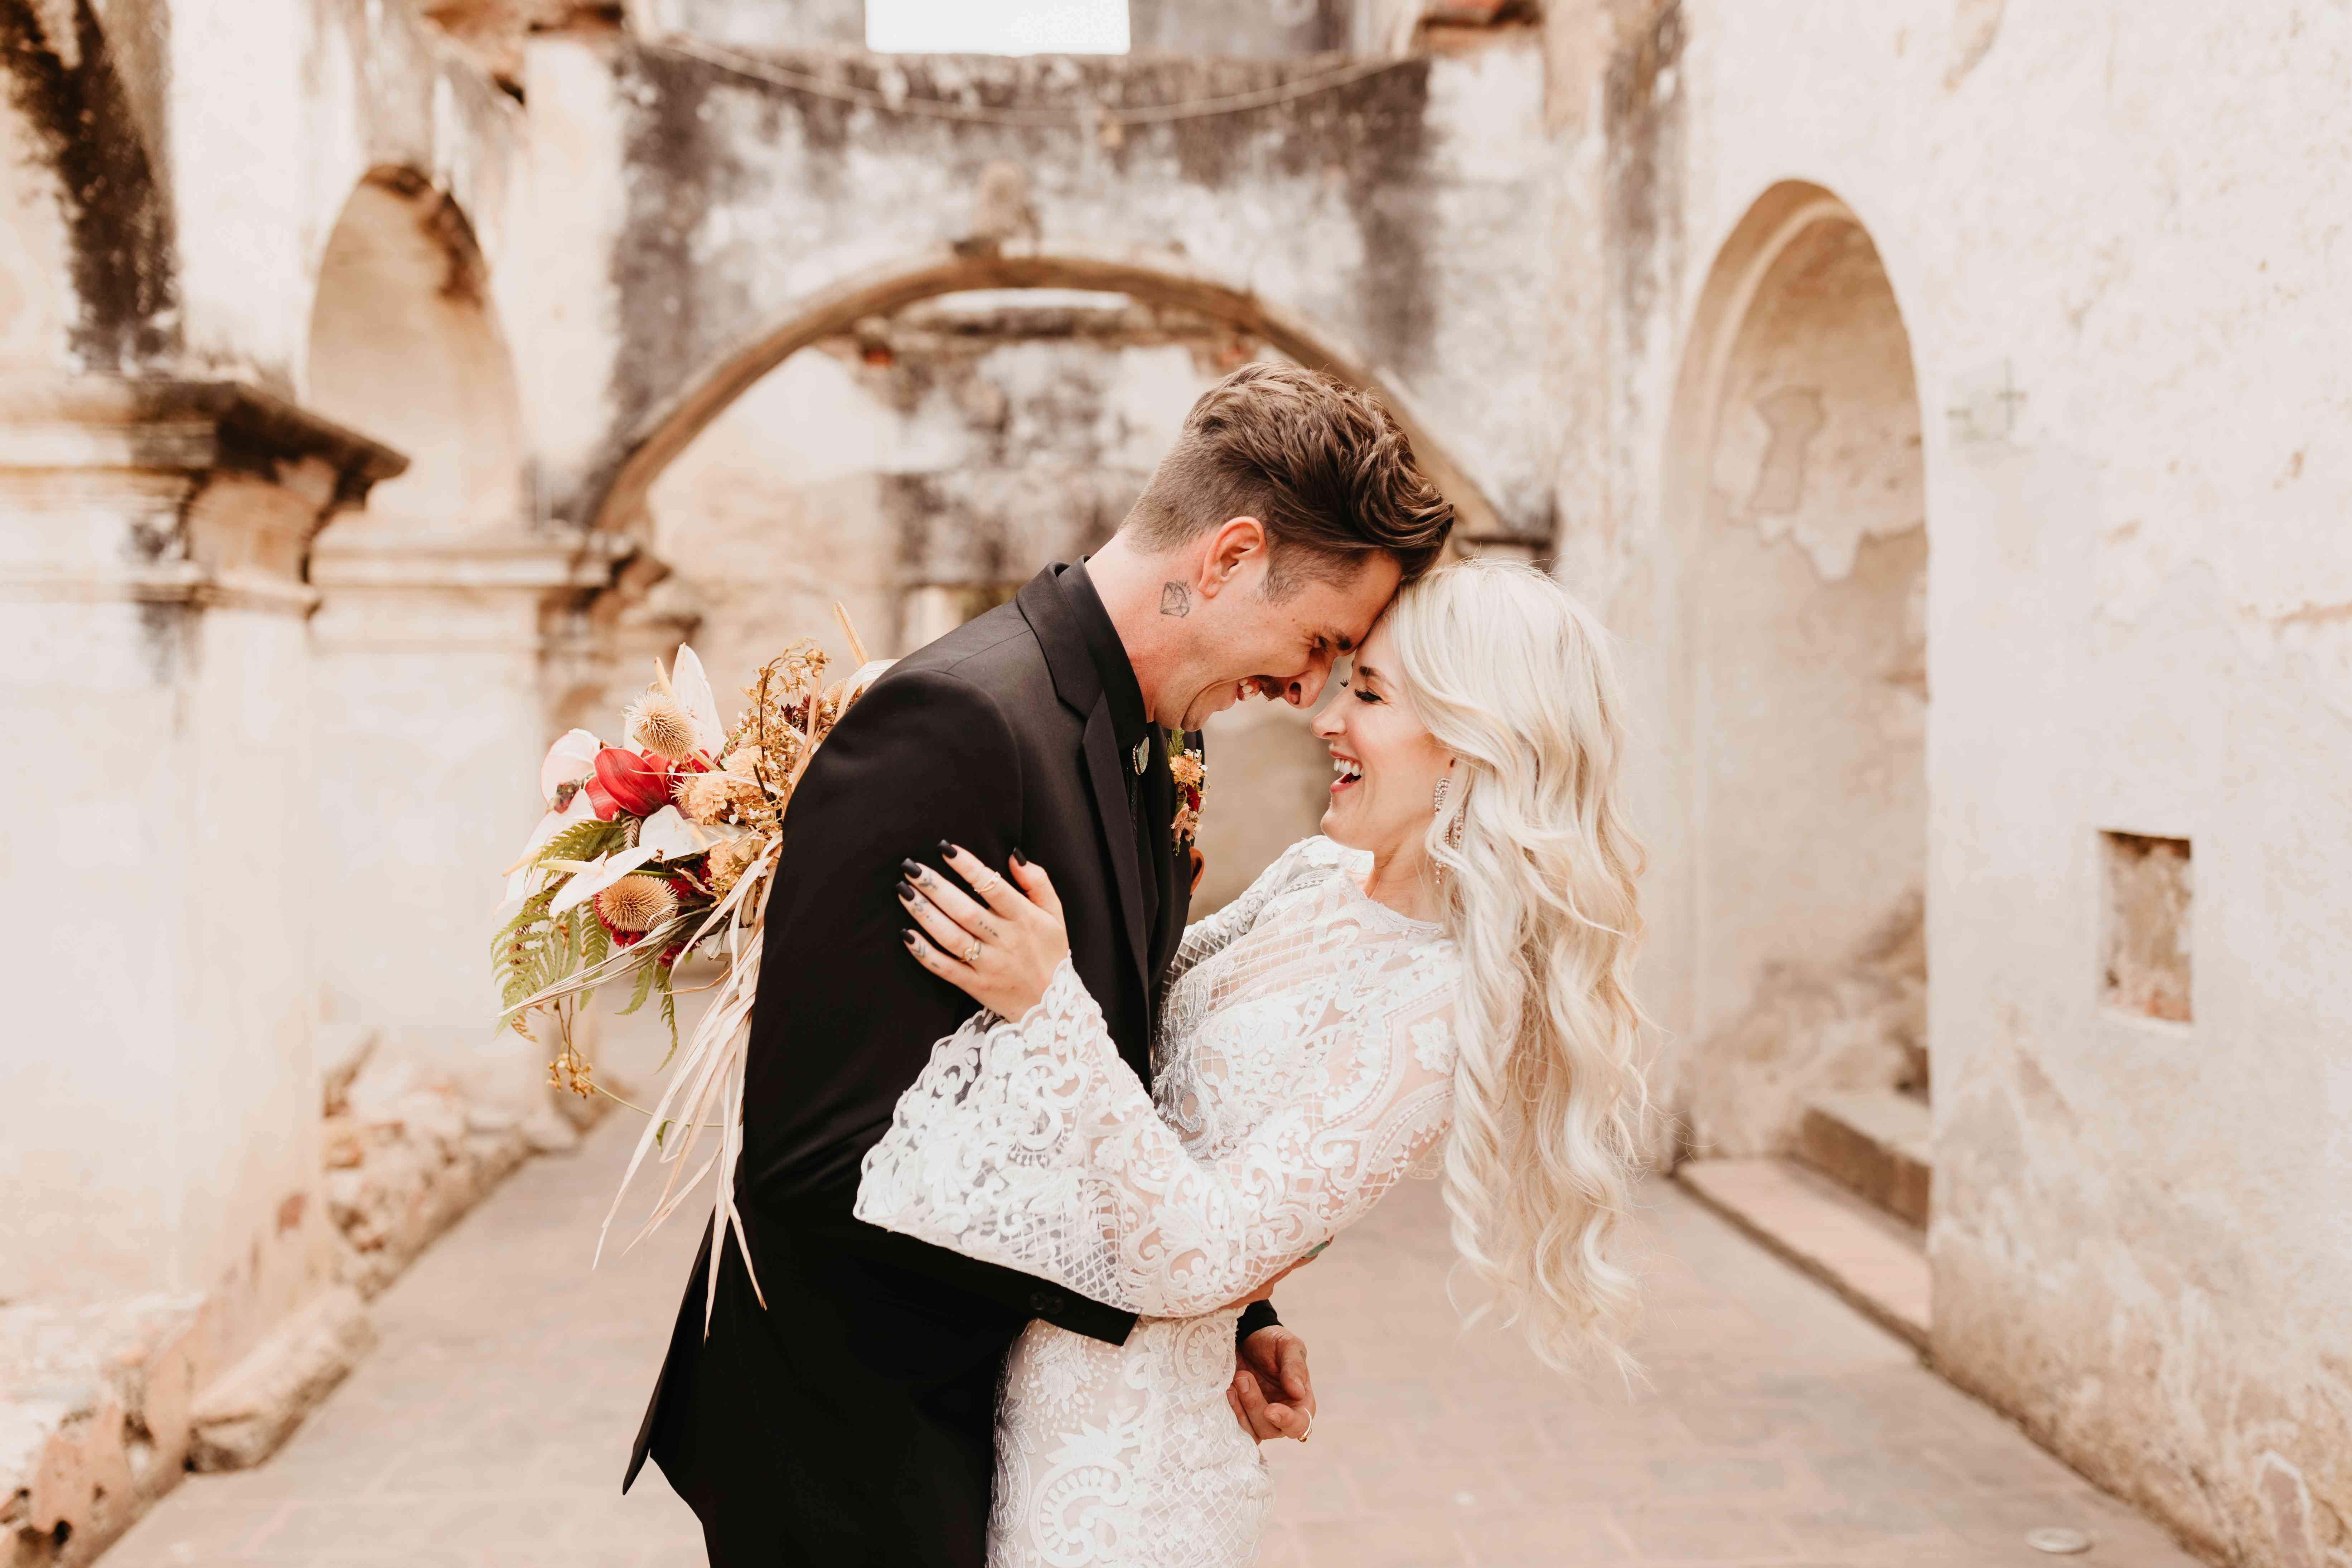 Bride and groom smiling and embracing, bride wearing black nail polish